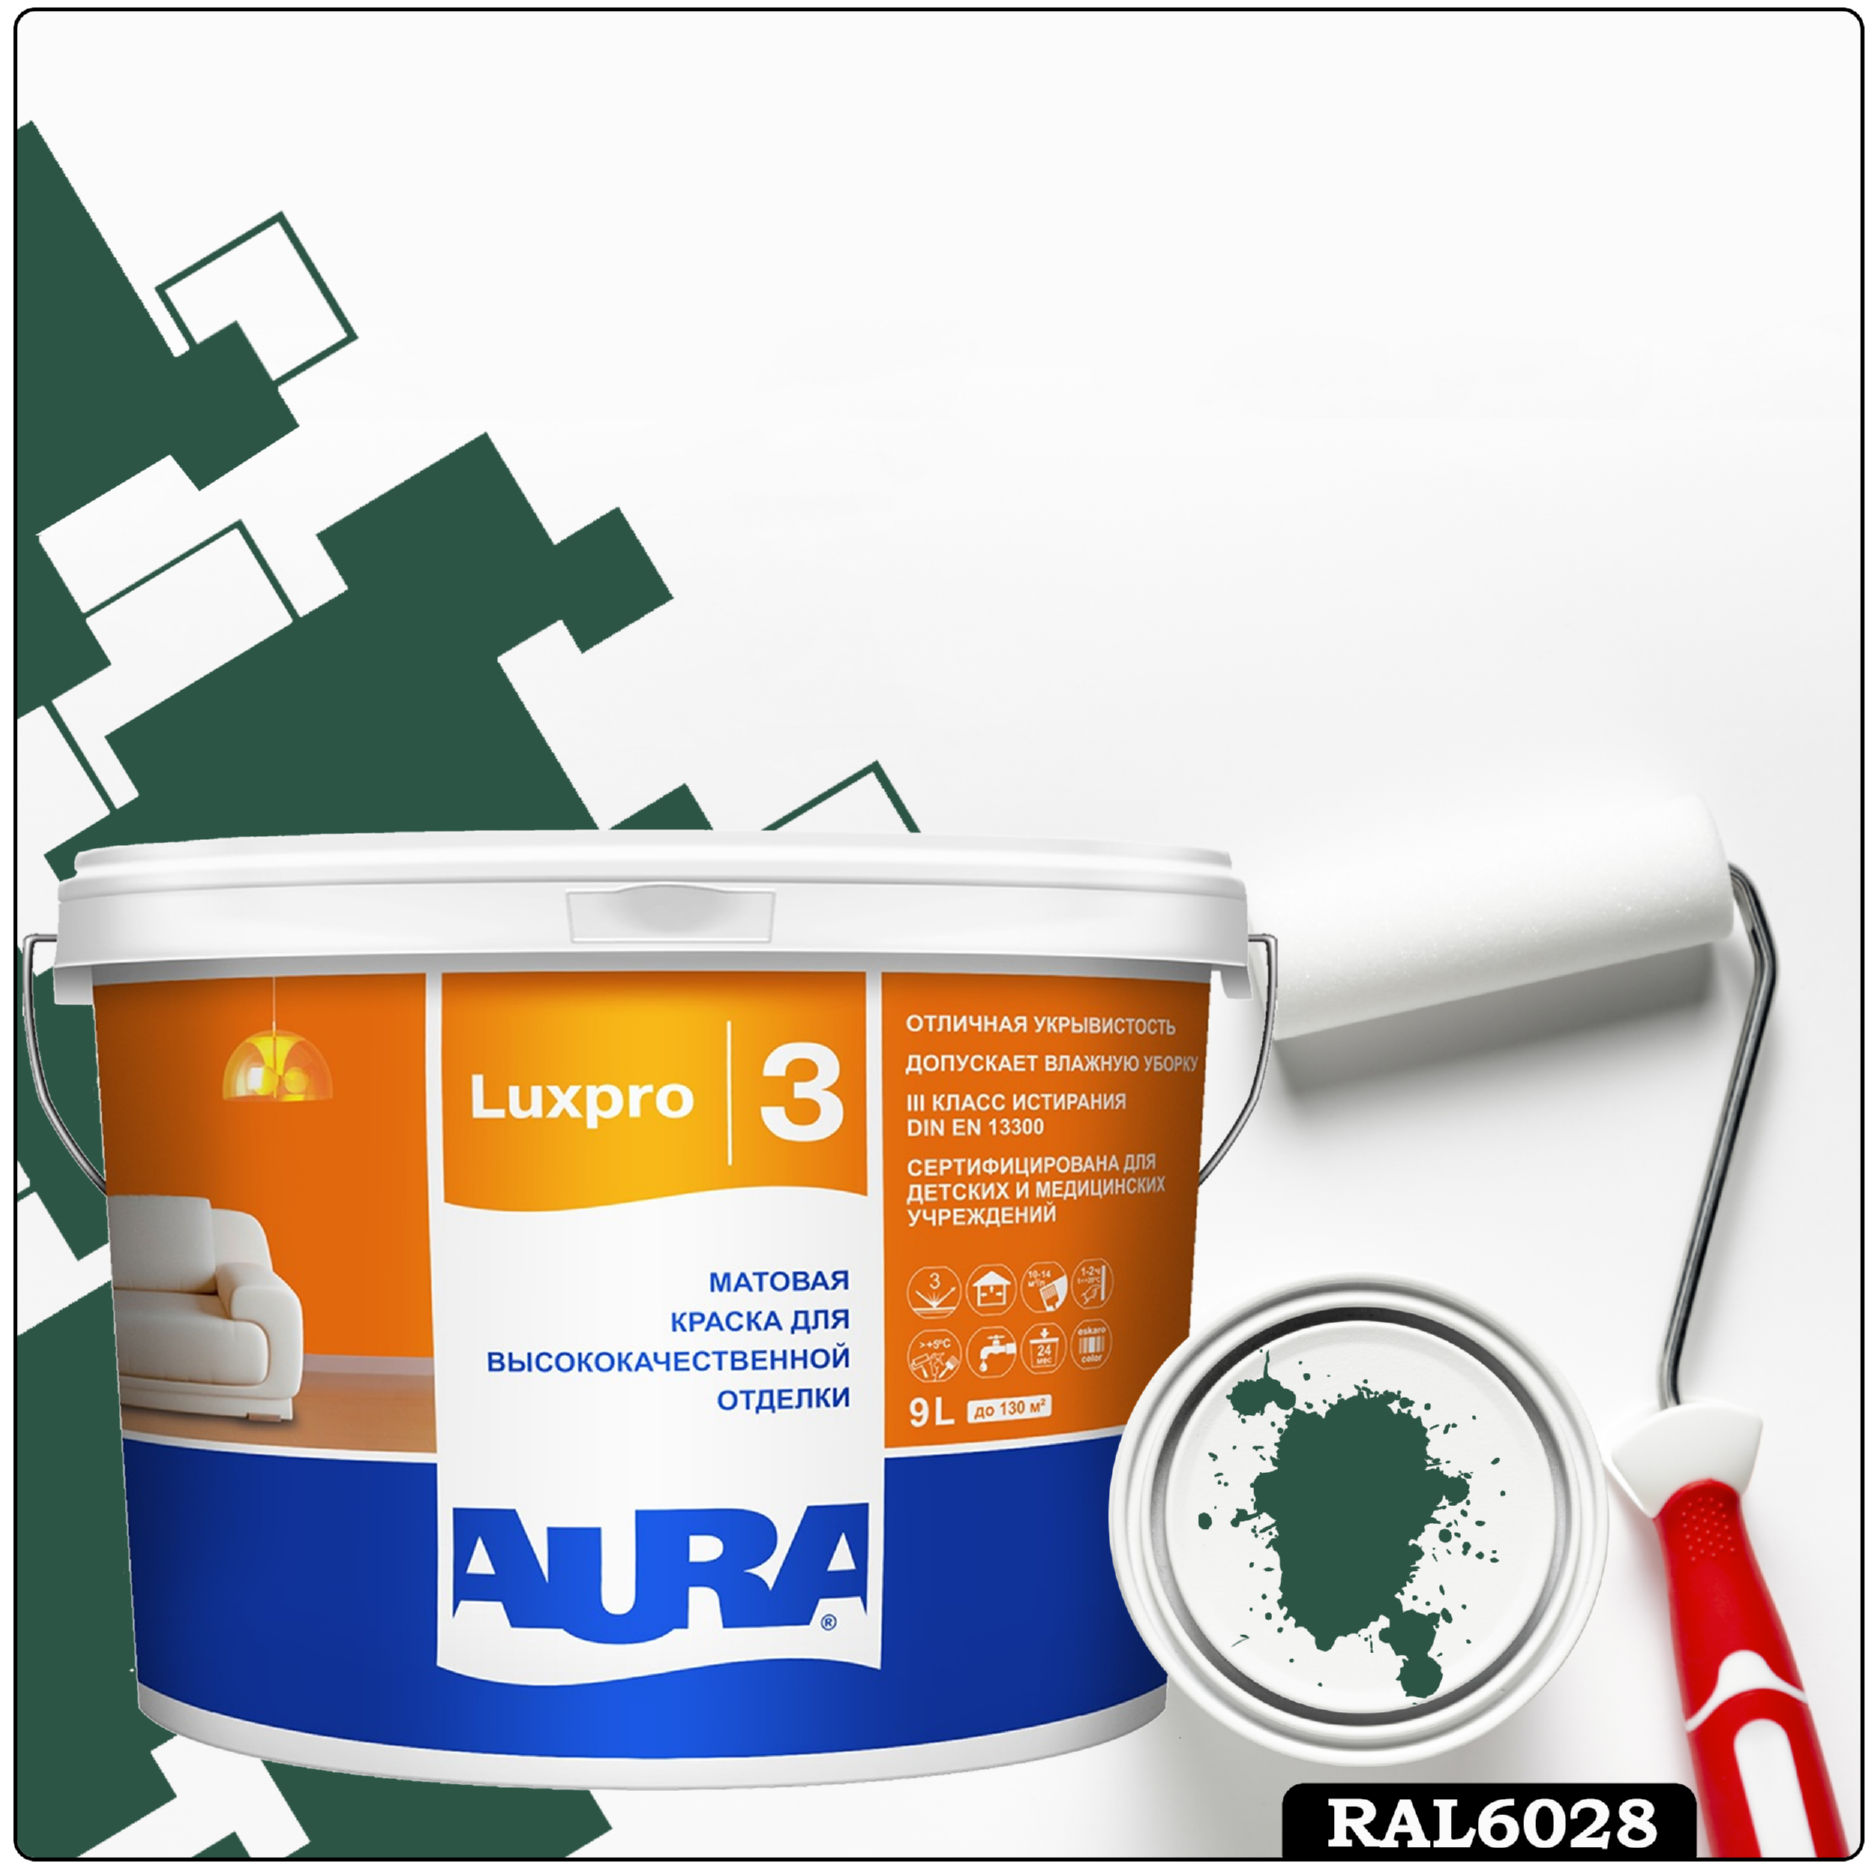 Фото 2 - Краска Aura LuxPRO 3, RAL 6028 Зеленый сосна, латексная, шелково-матовая, интерьерная, 9л, Аура.